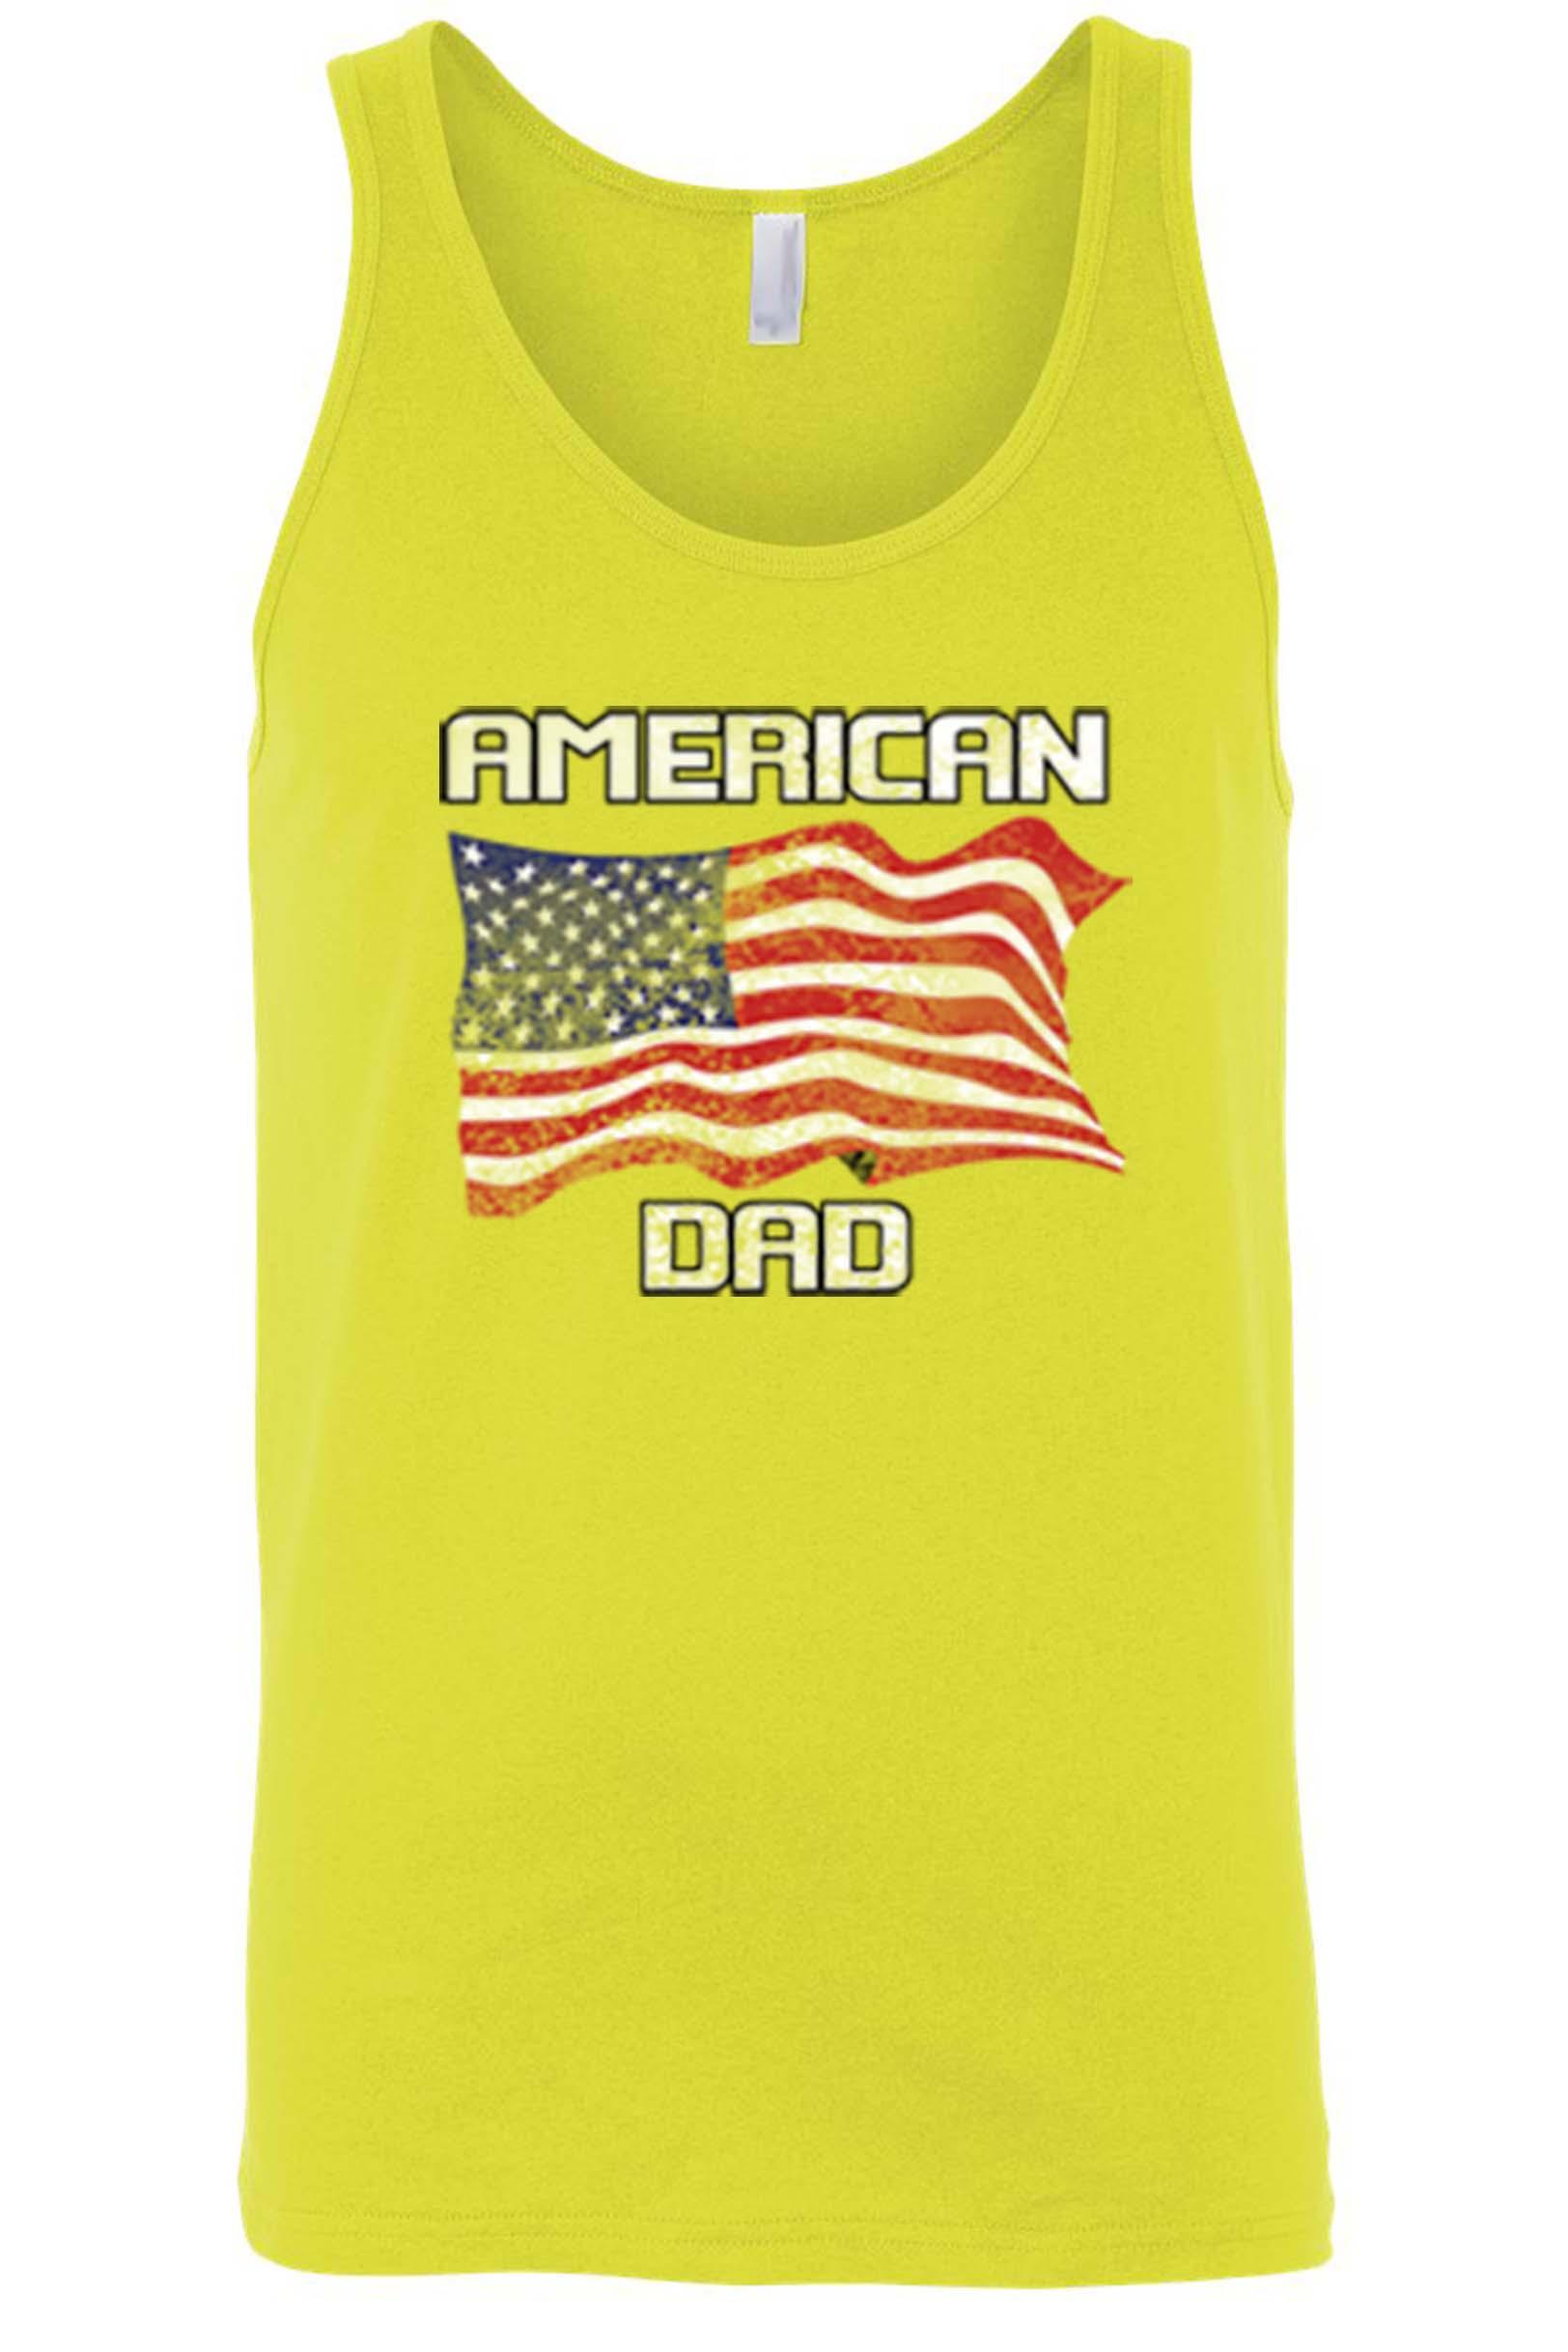 Men's American Dad USA Flag Tank Top Shirt